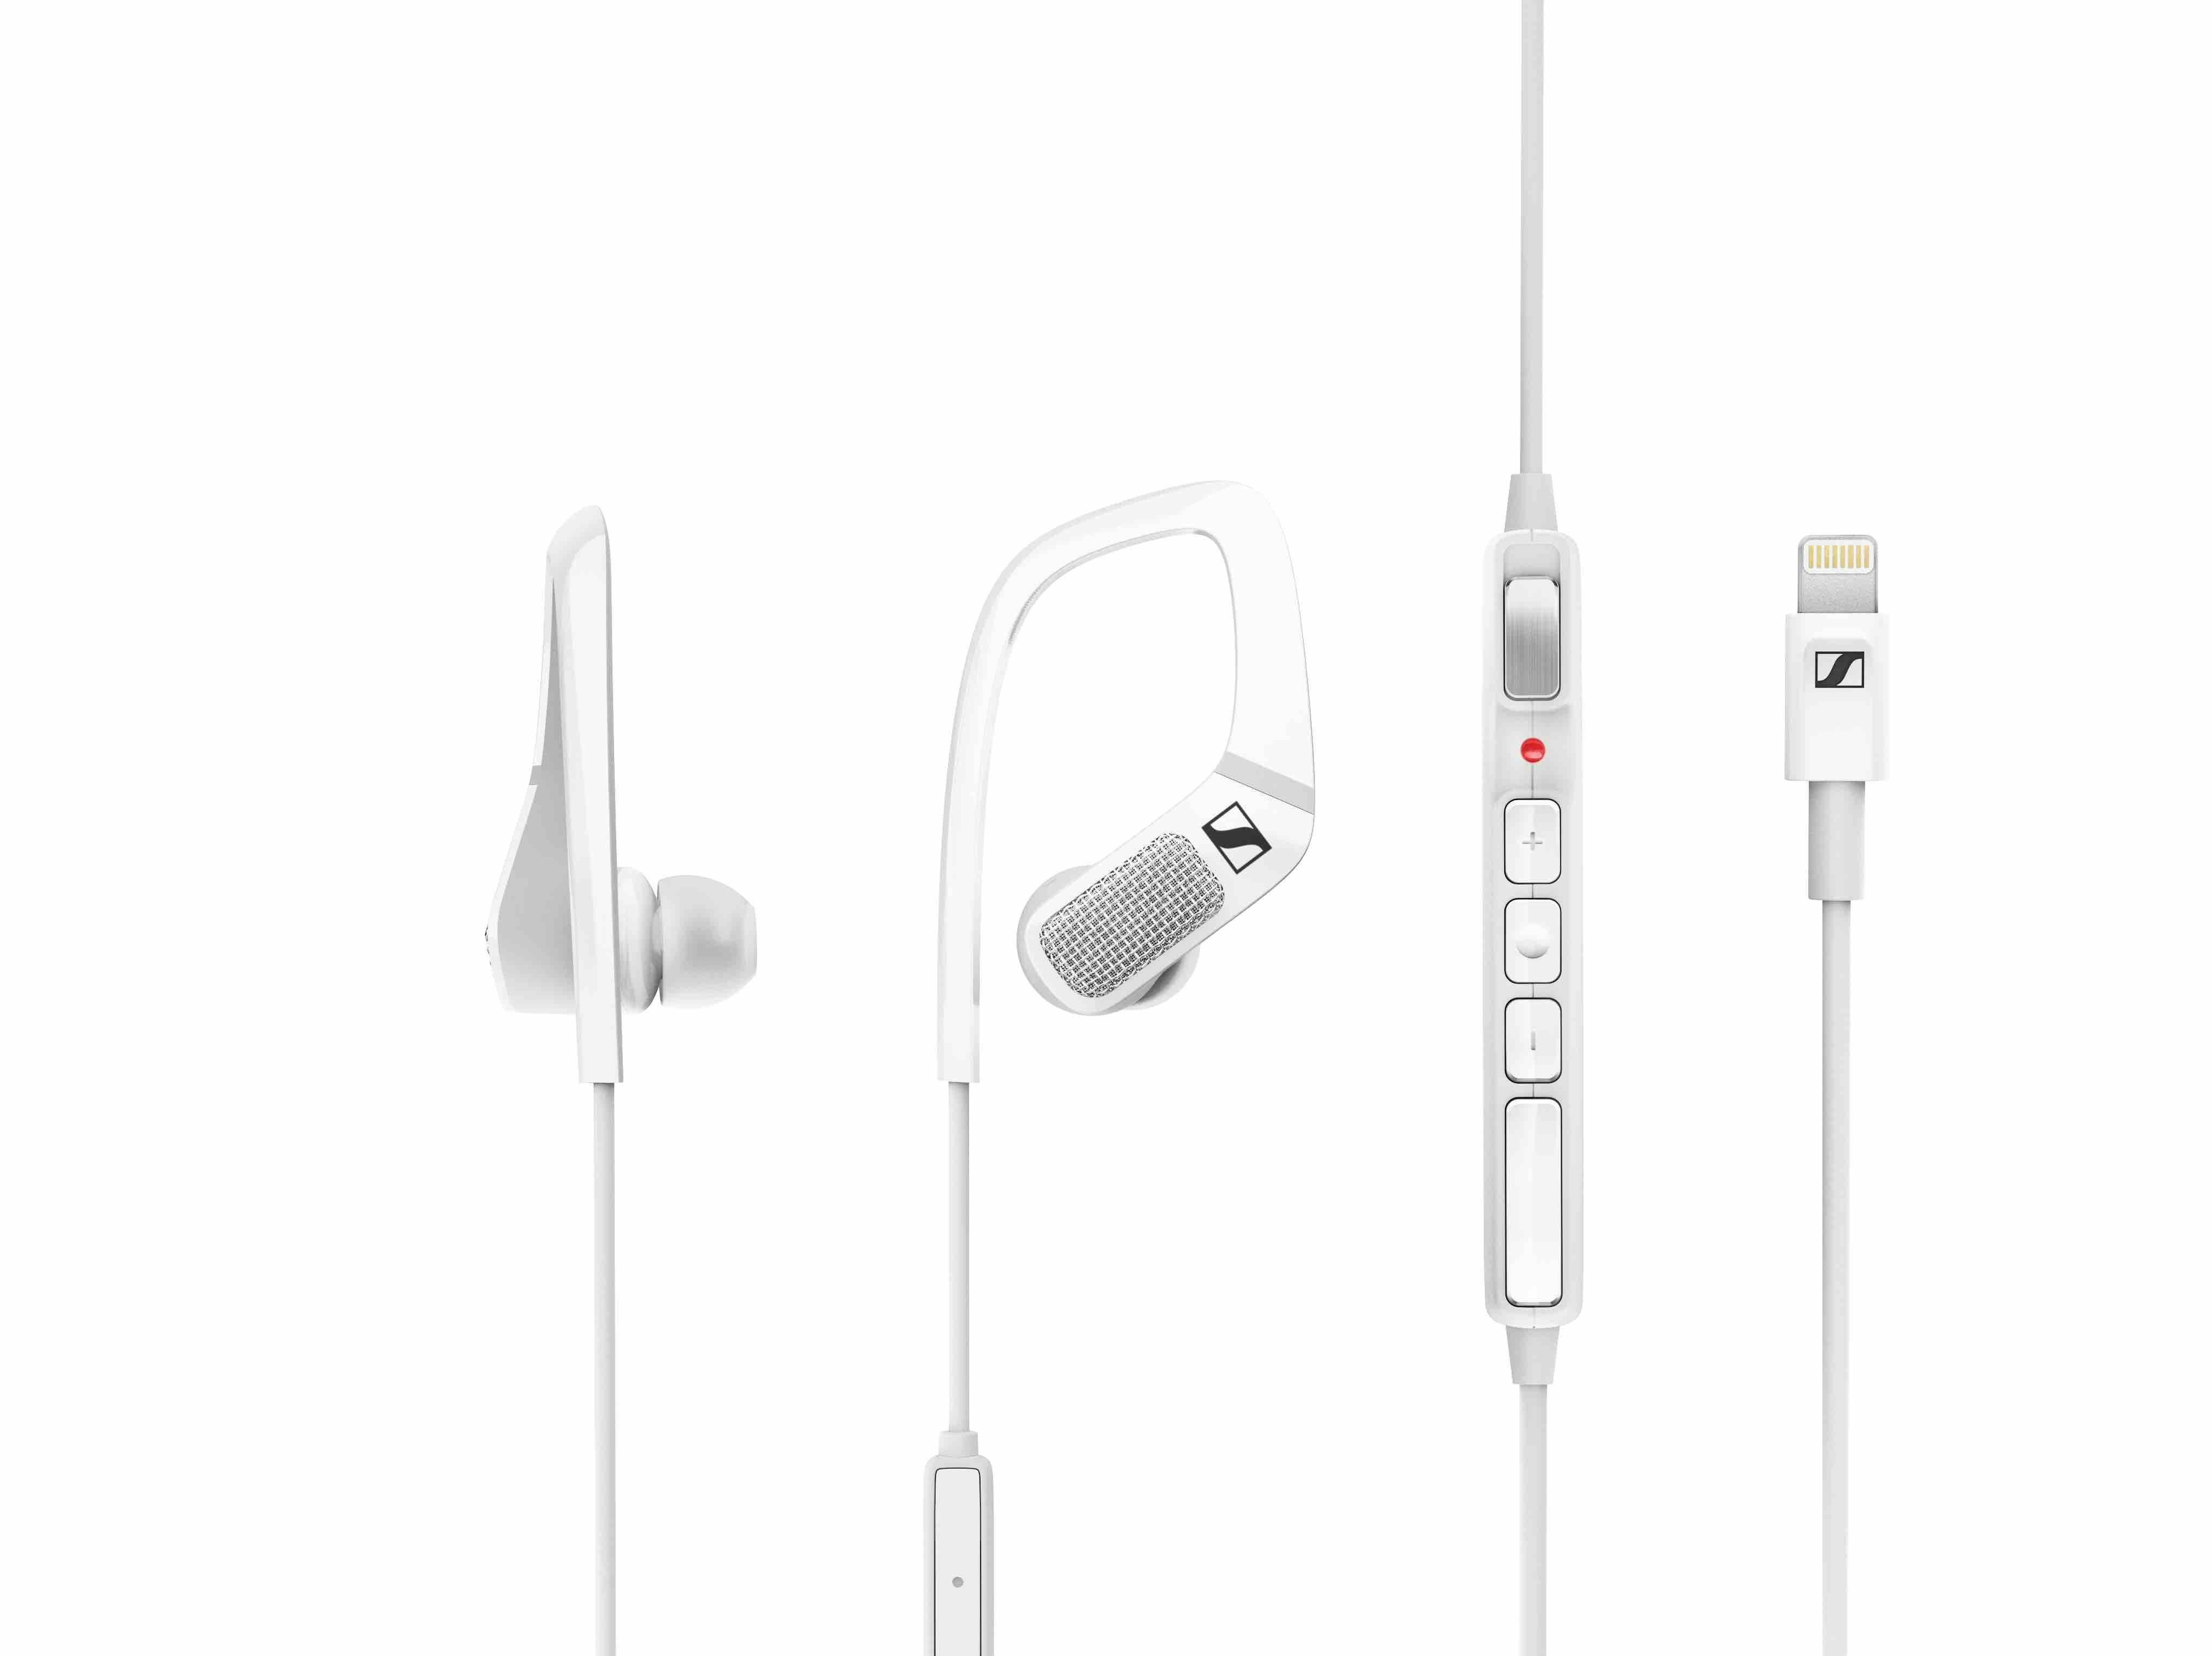 Sennheiser Showcases AMBEO Smart Headset at IFA GPC 2017